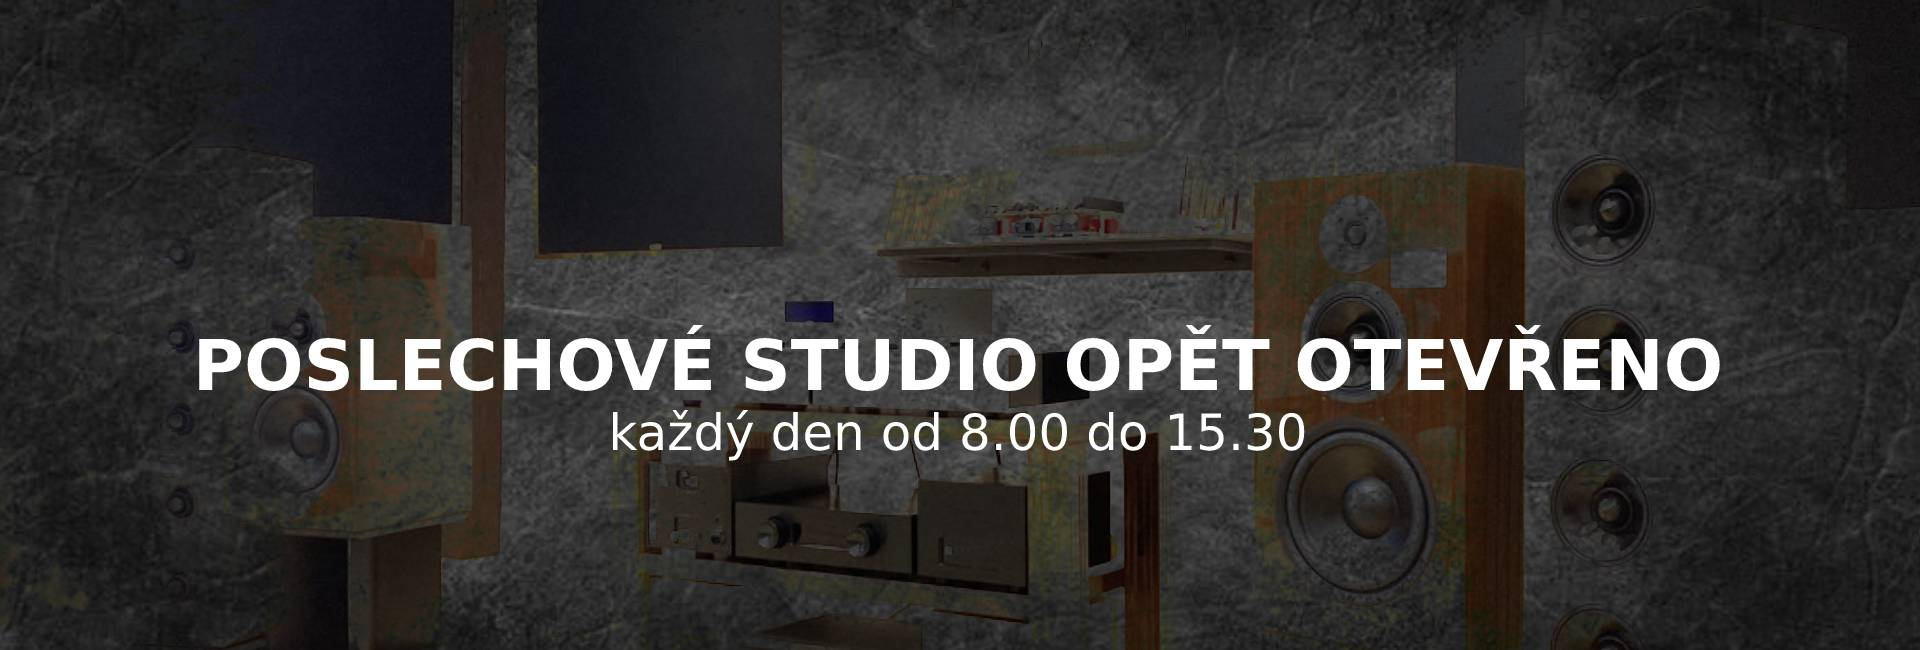 poslechove-studio-opet-otevreno